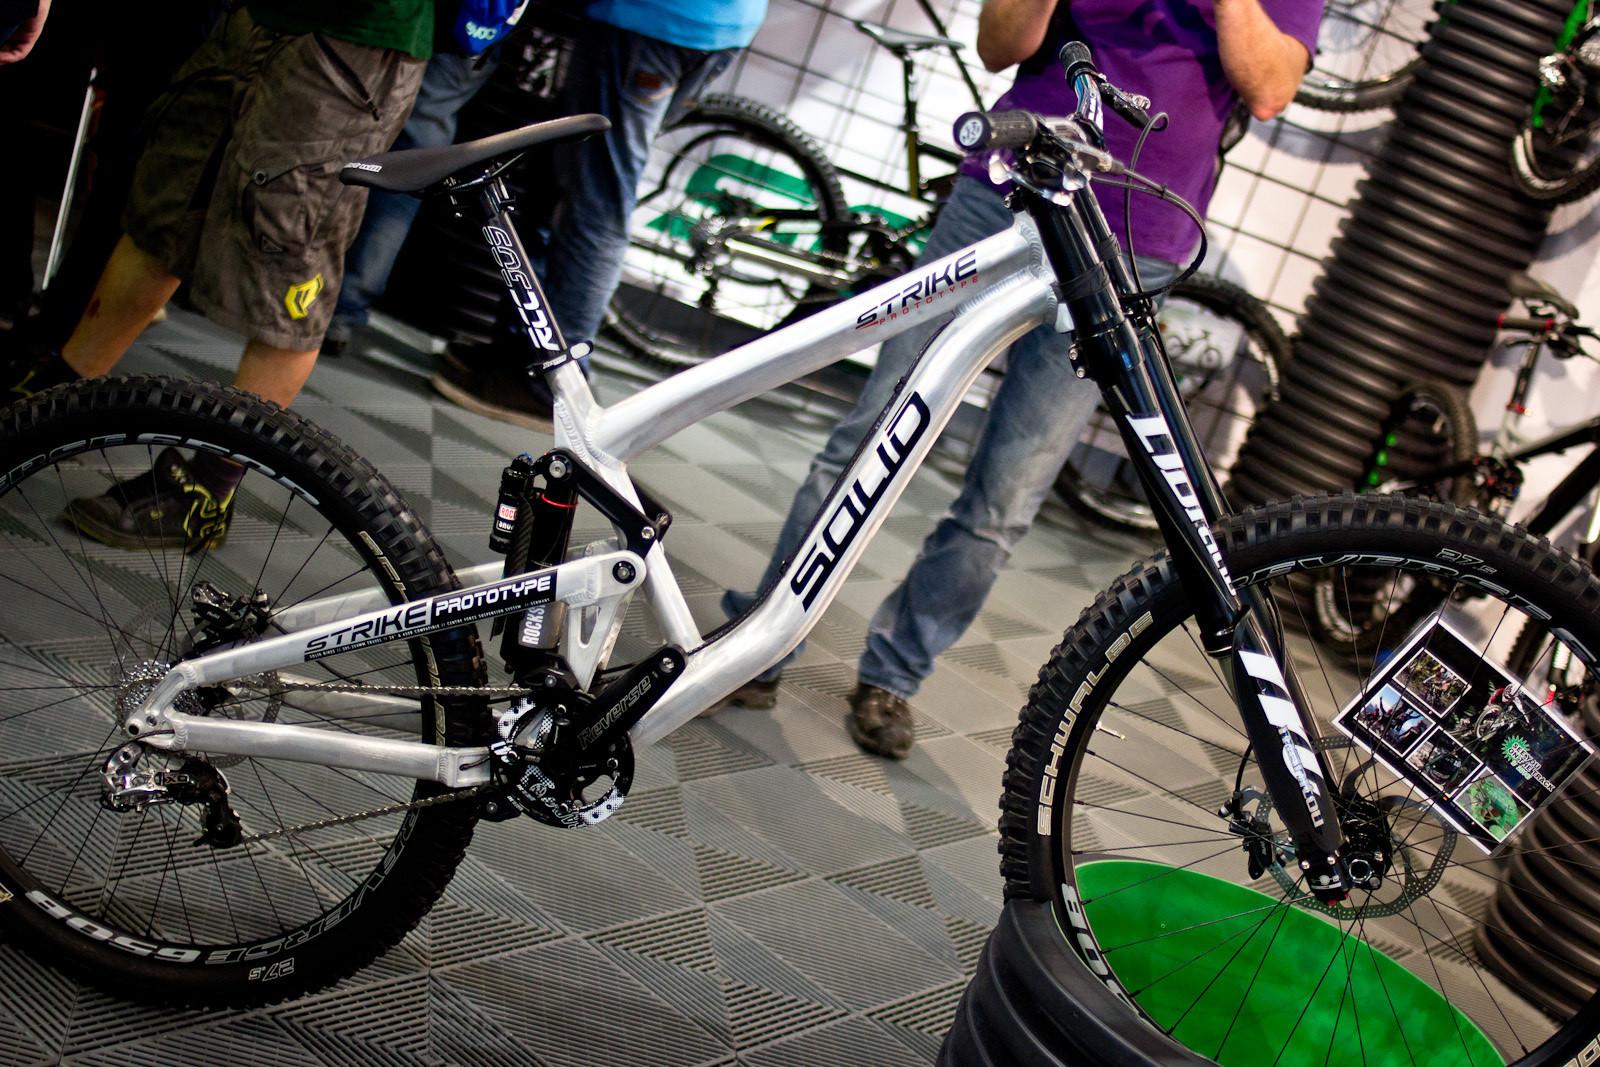 One Dozen New and Prototype 2014 Downhill Bikes: Solid Strike  - 2014 Downhill Bikes at Eurobike 2013 - Mountain Biking Pictures - Vital MTB